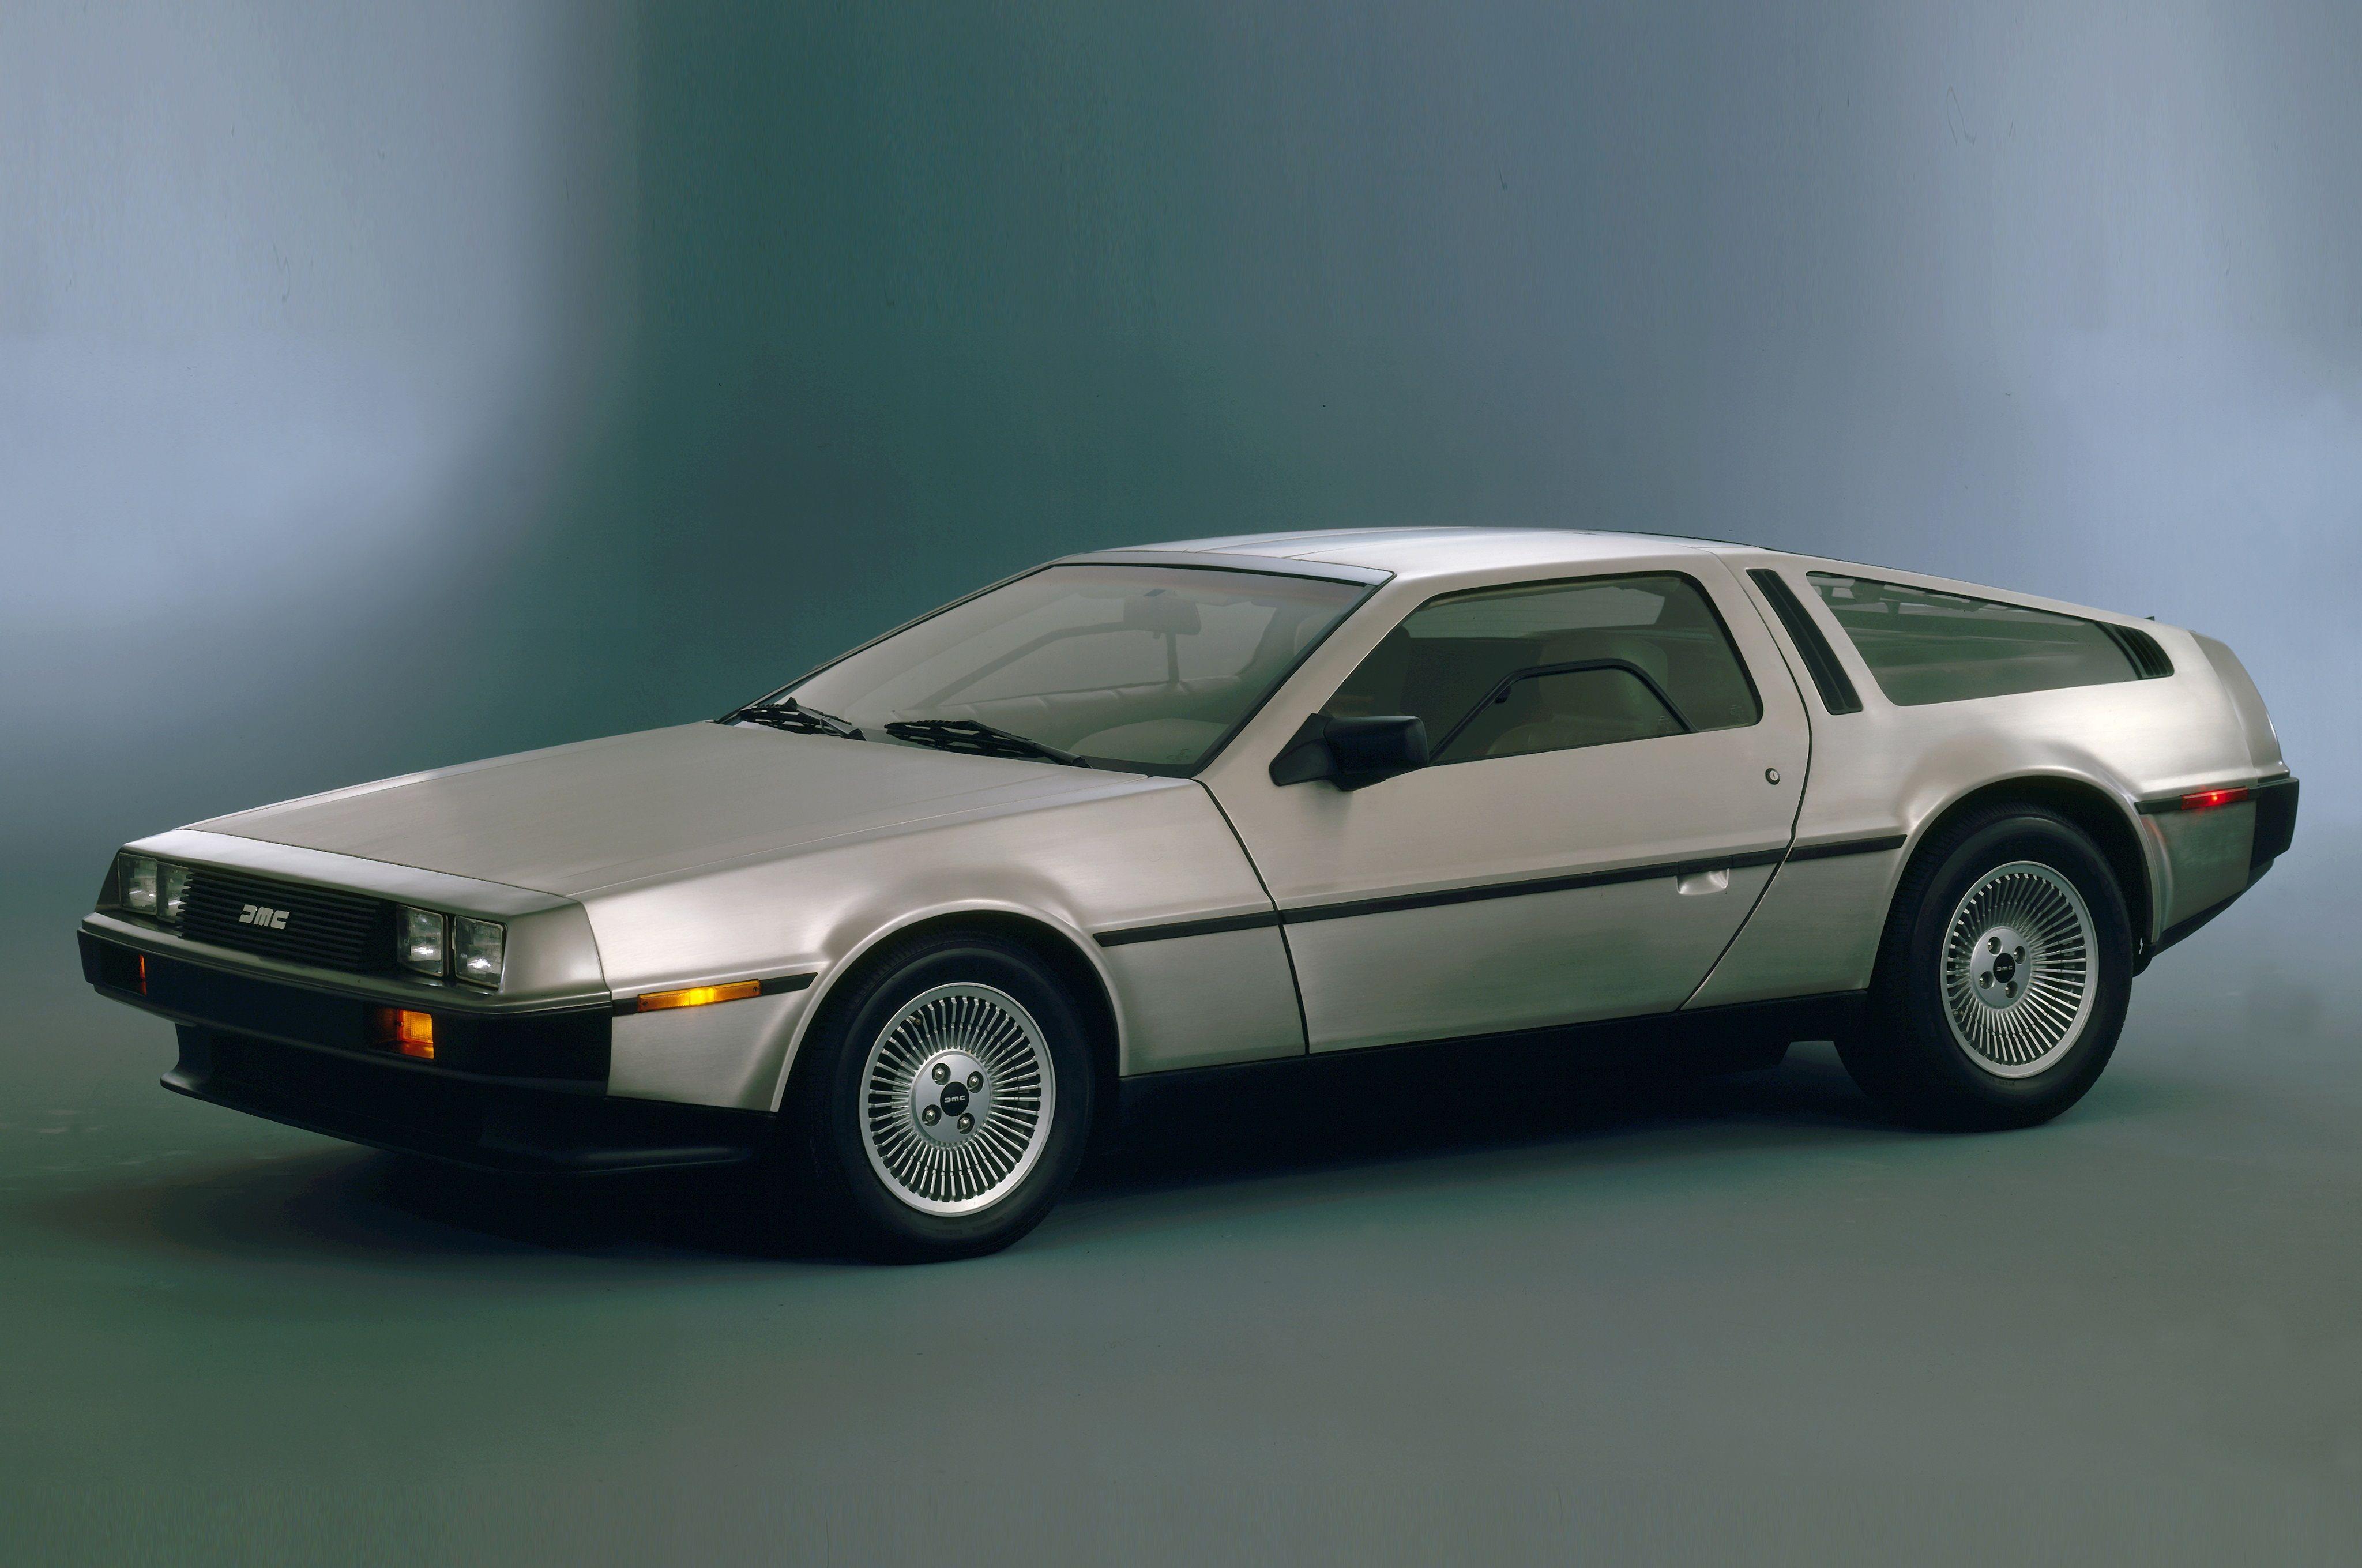 1982 DeLorean DMC-12 | Other Super Exotics or Unique Vehicles ...